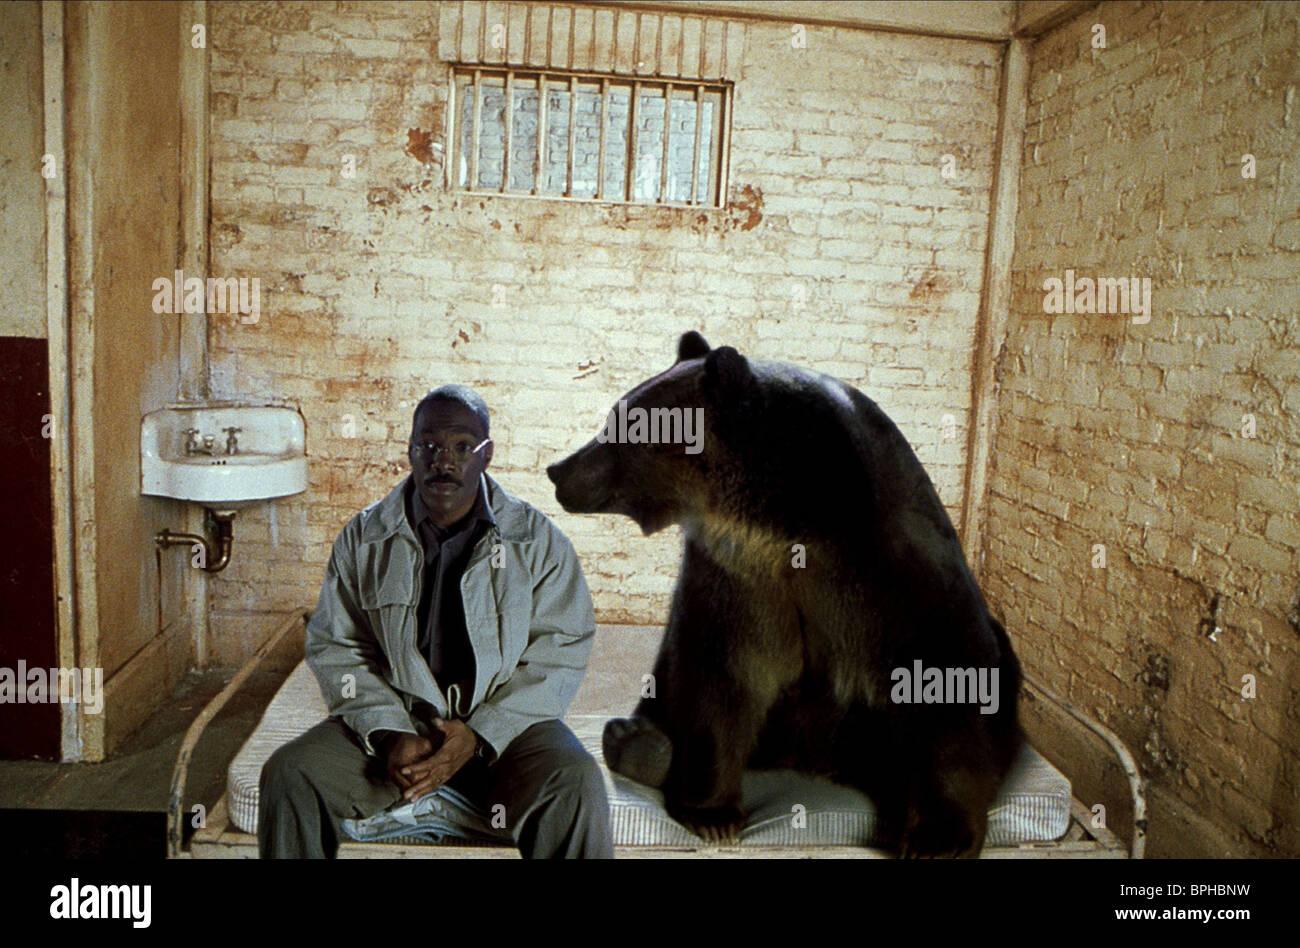 Eddie Murphy Bear Dr Dolittle 2 2001 Stock Photo Alamy